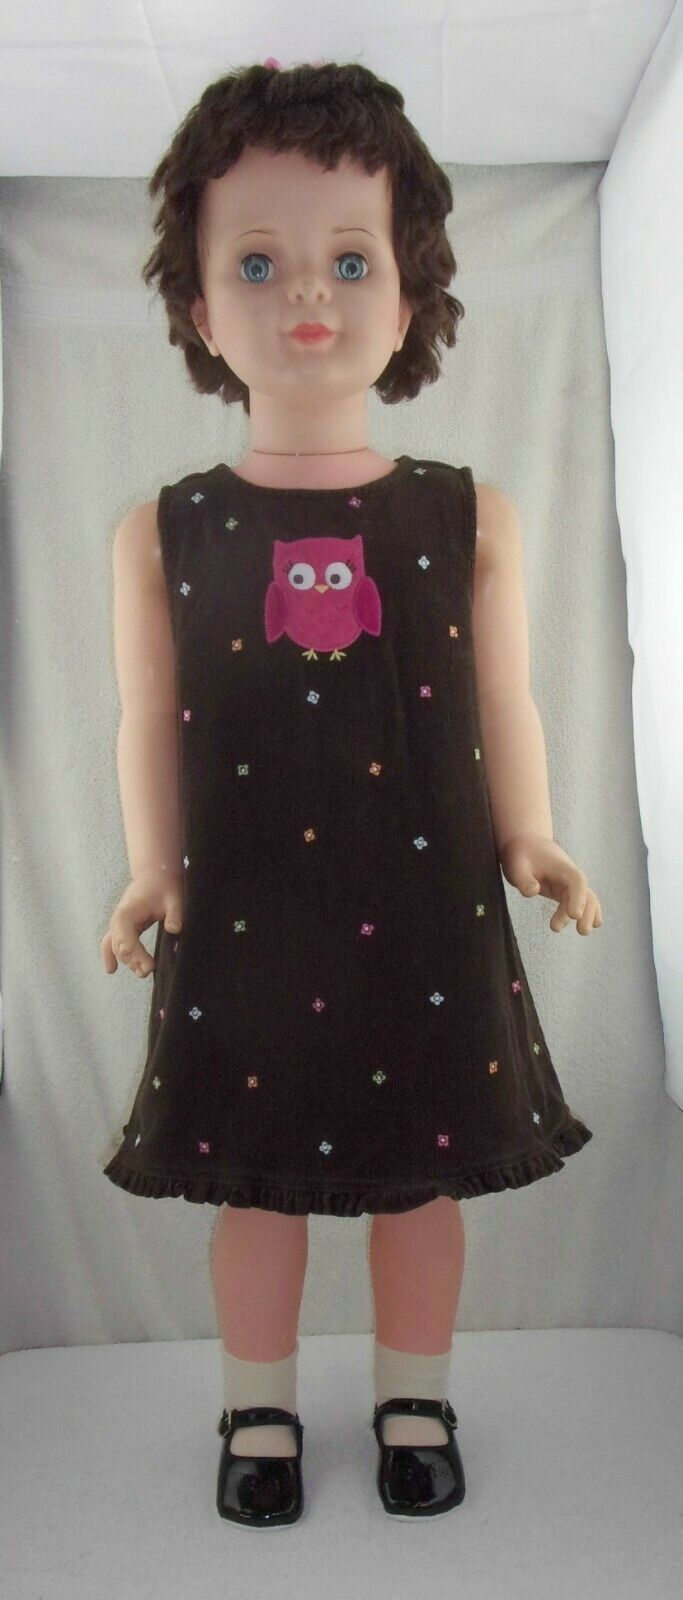 Doll Clothes Gymboree Corduroy Floral Owl Dress 2 Toddler fits Patti Playpal